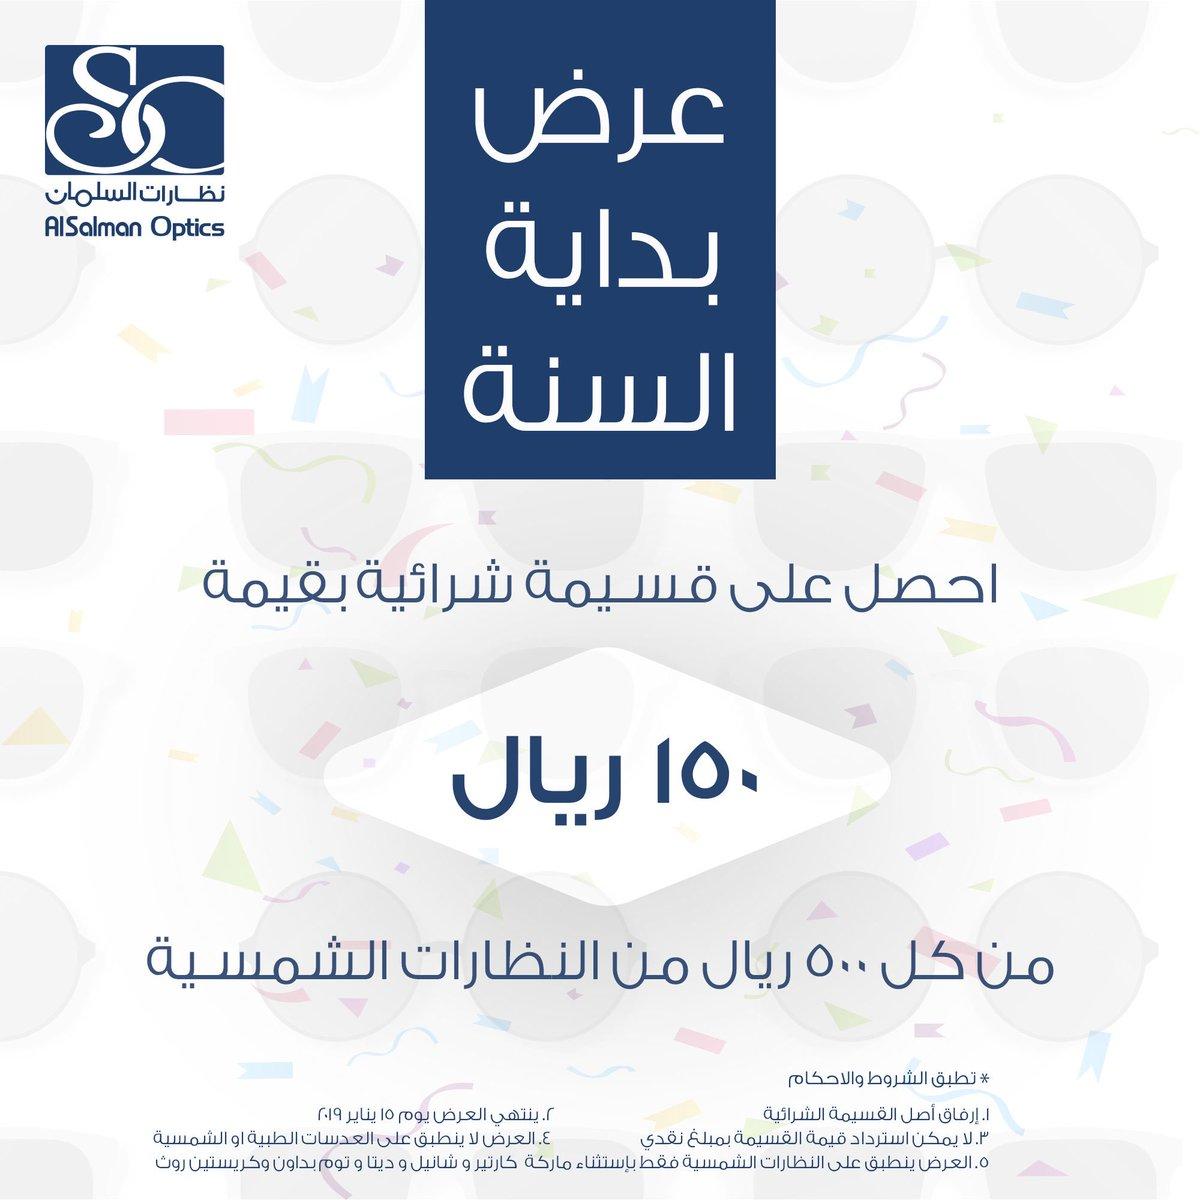 bf6c35c37 ... كل ٥٠٠ ريال على النظارات الشمسية و استخدامها في الحال للمزيد من  التفاصيل https://goo.gl/GbX5T2 . . #نظارات_السلمان #عروض #الرياض  #AlsalmanOptics #offers ...